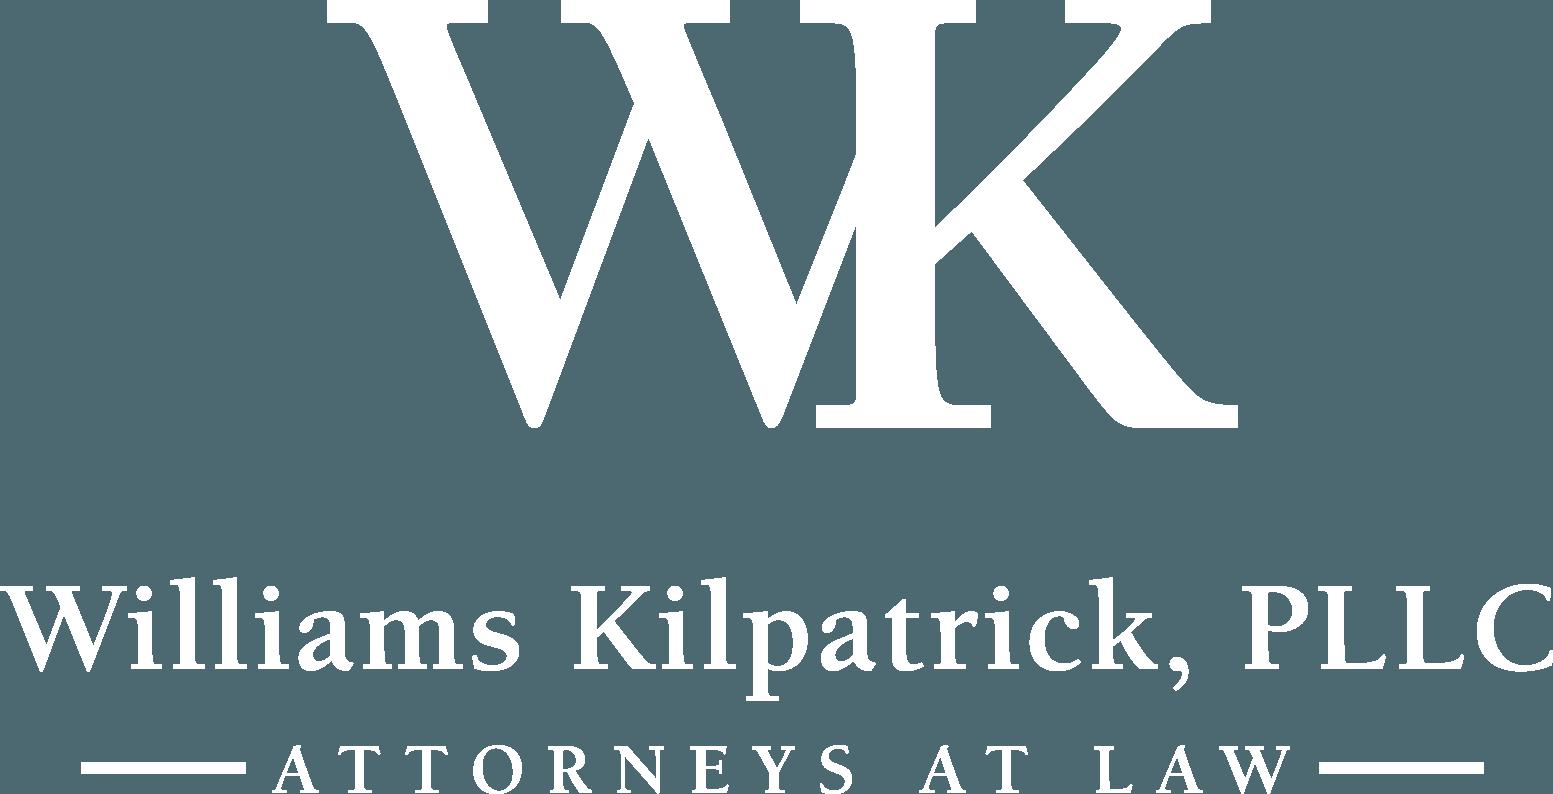 Williams_Kilpatrick_FullLockup_White